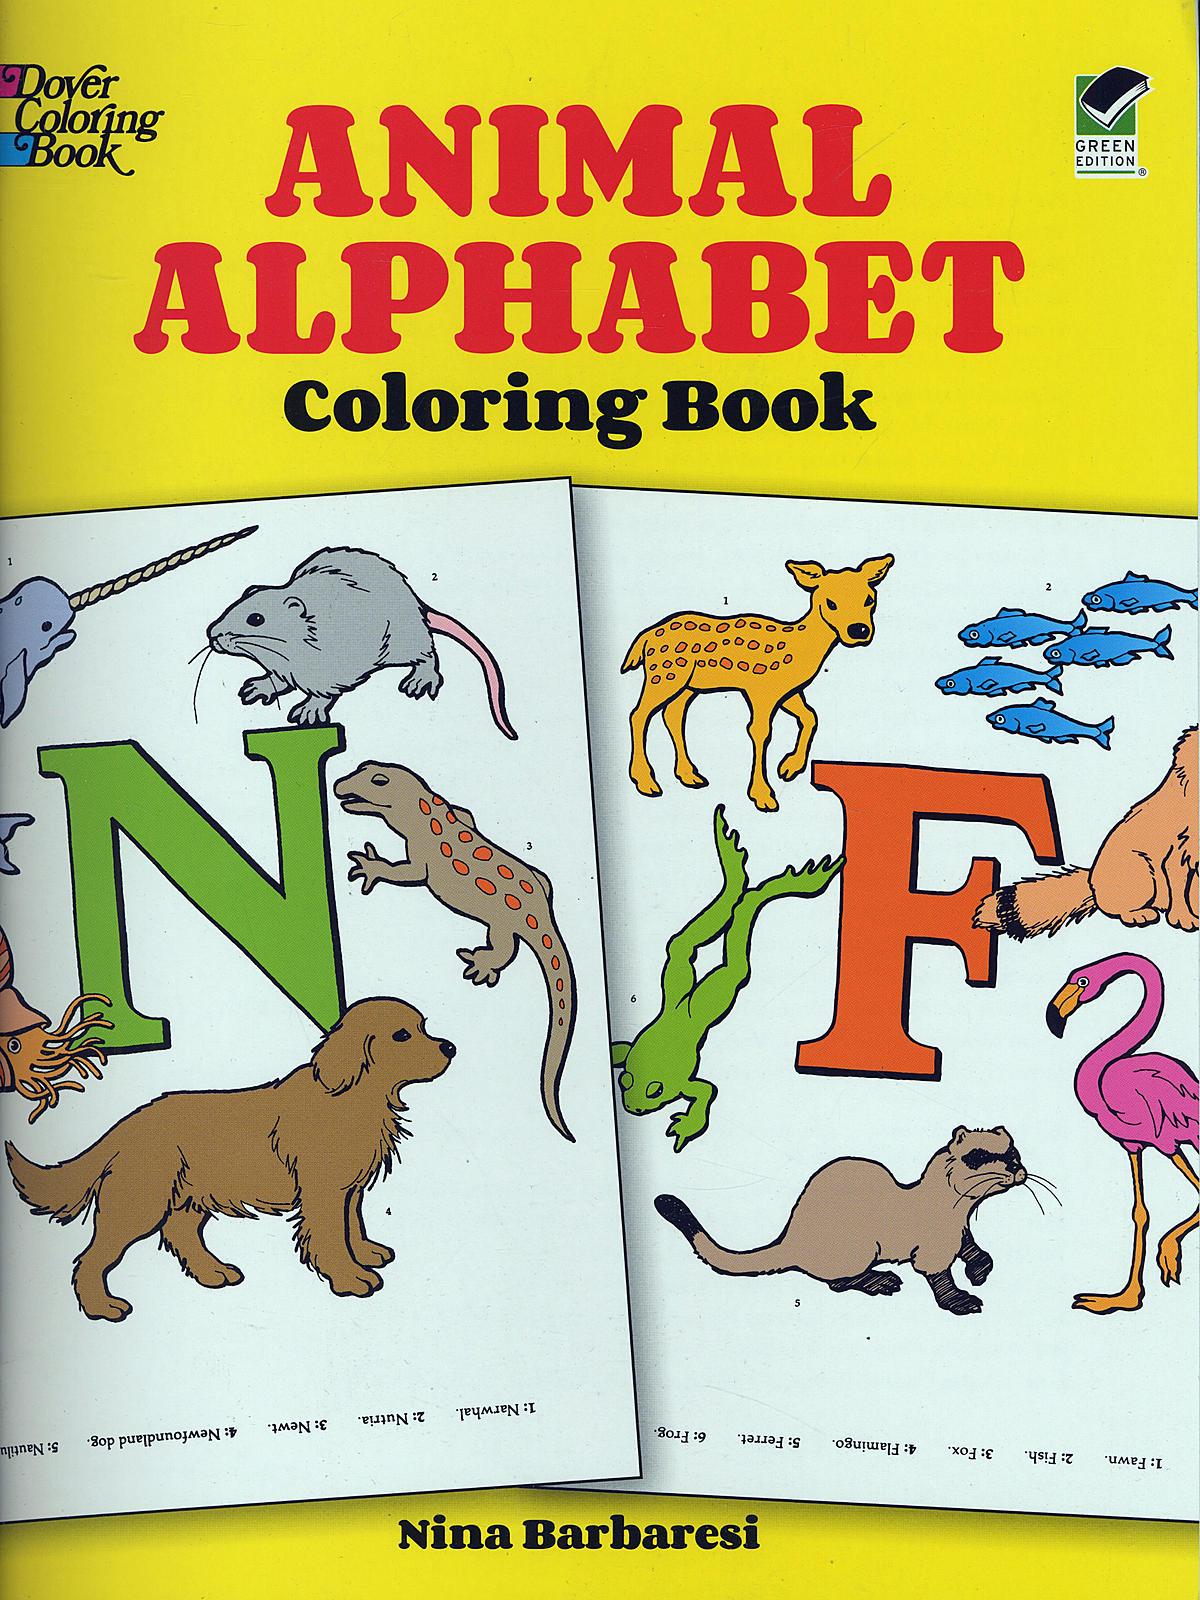 Animal Alphabet-Coloring Book